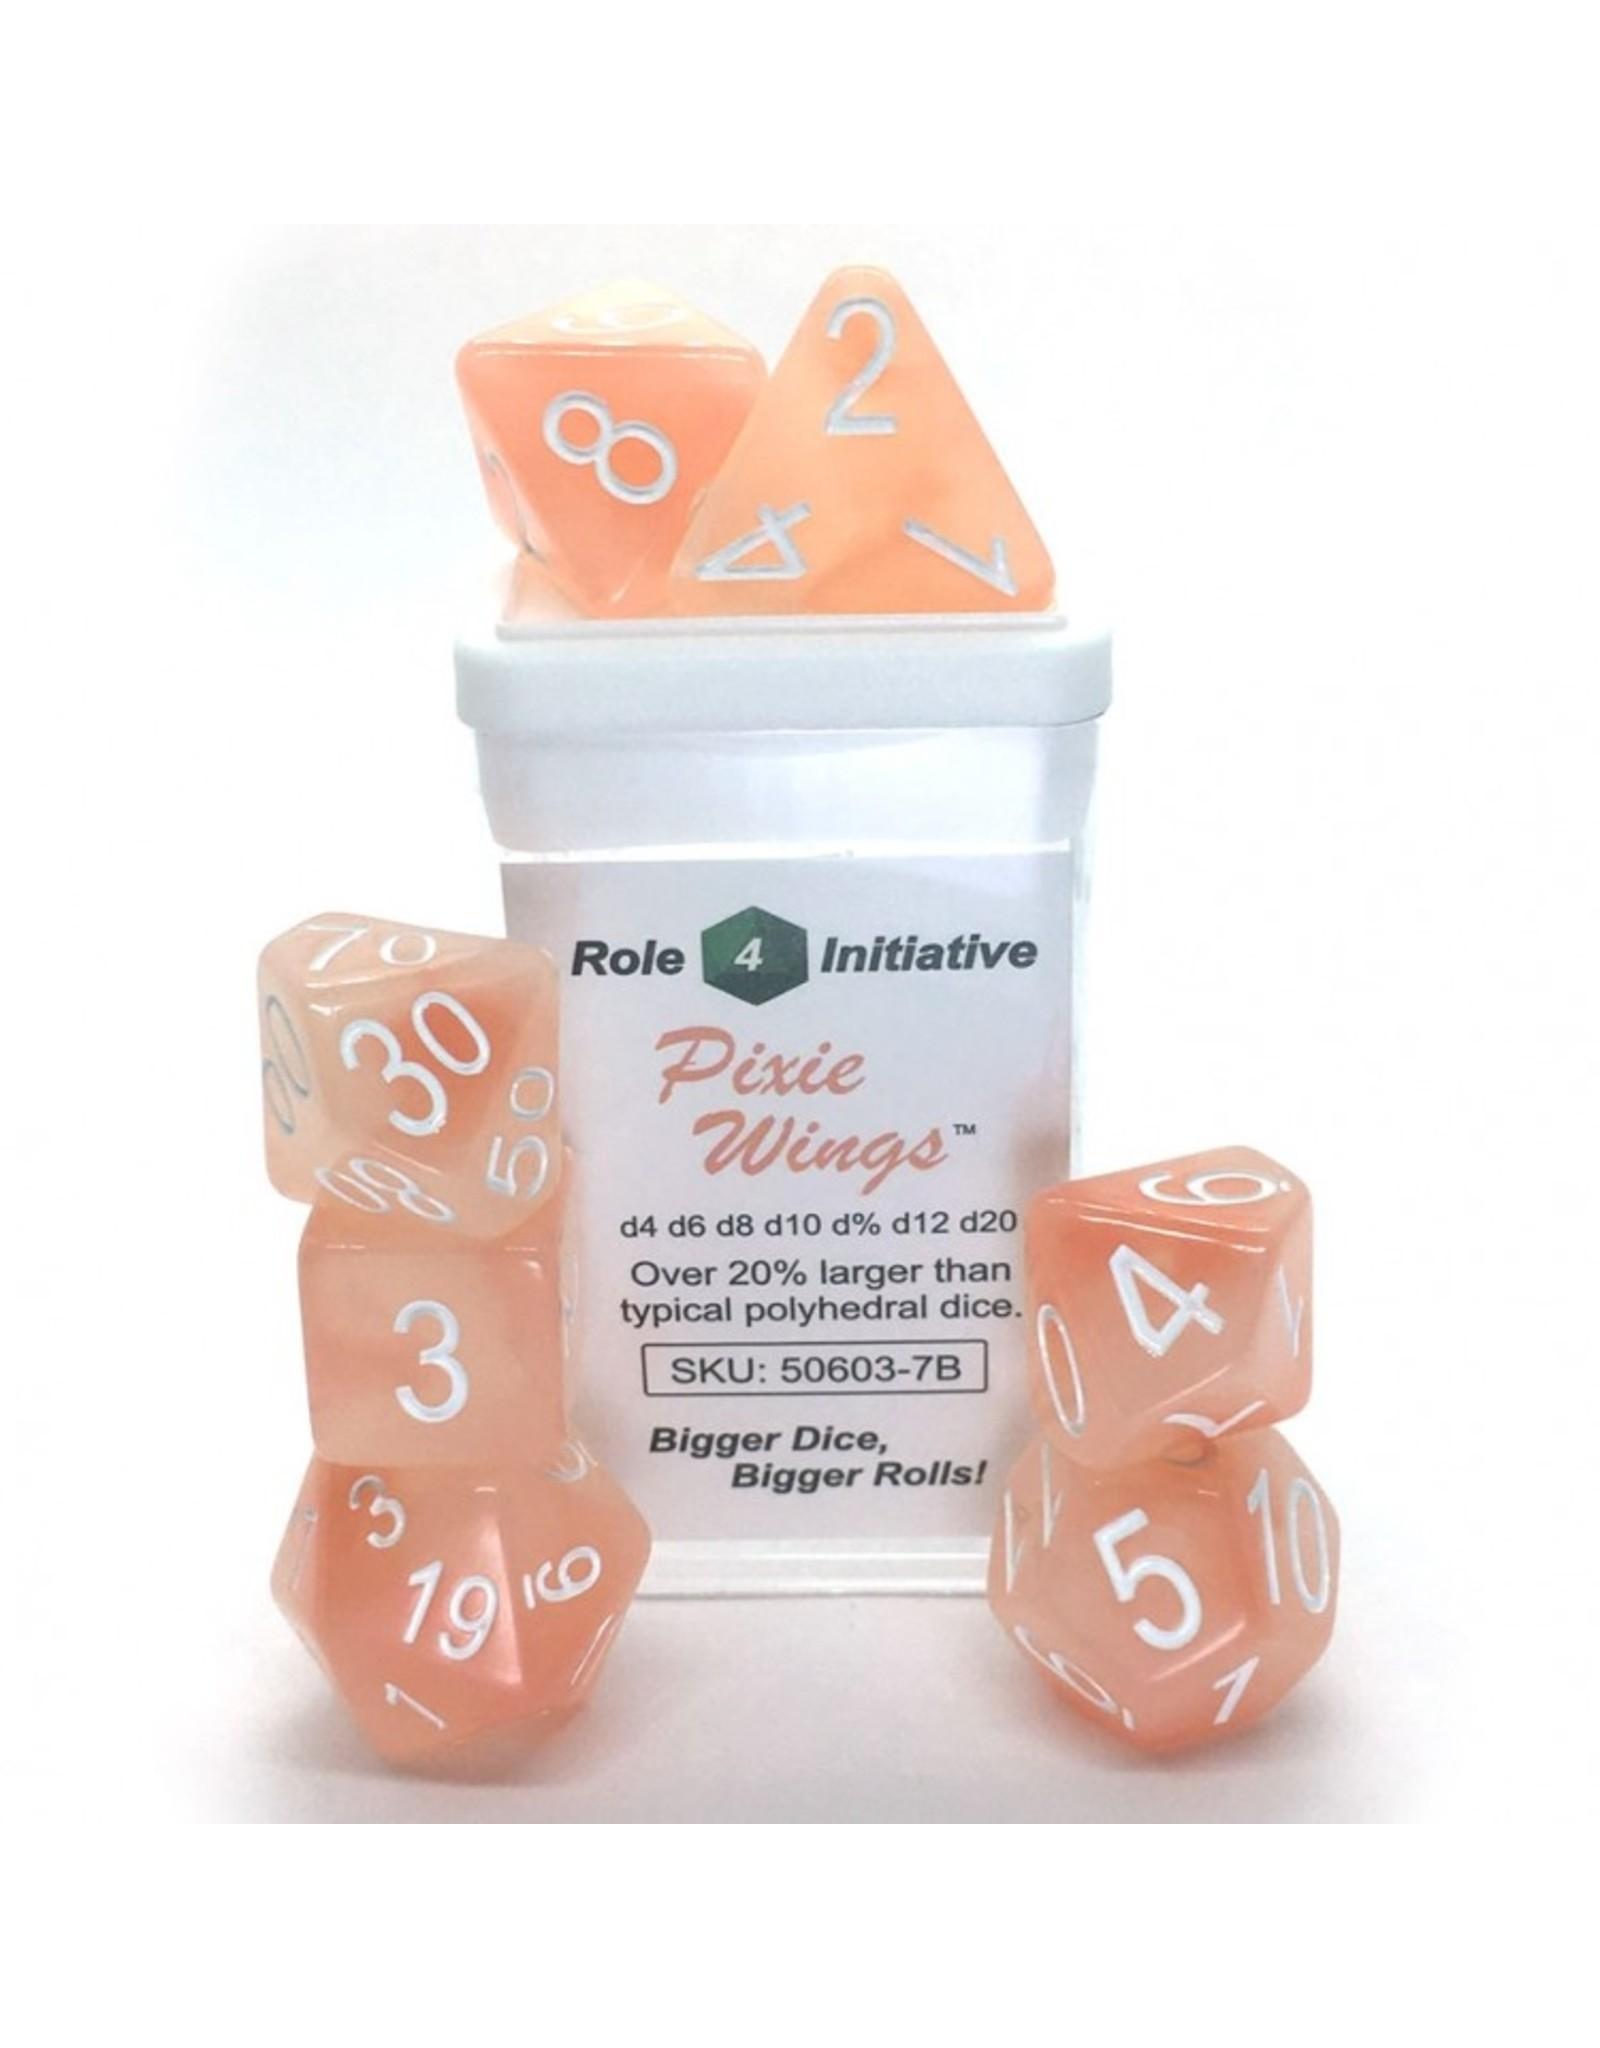 Role 4 Initiative 7-Set: Pixie Wings